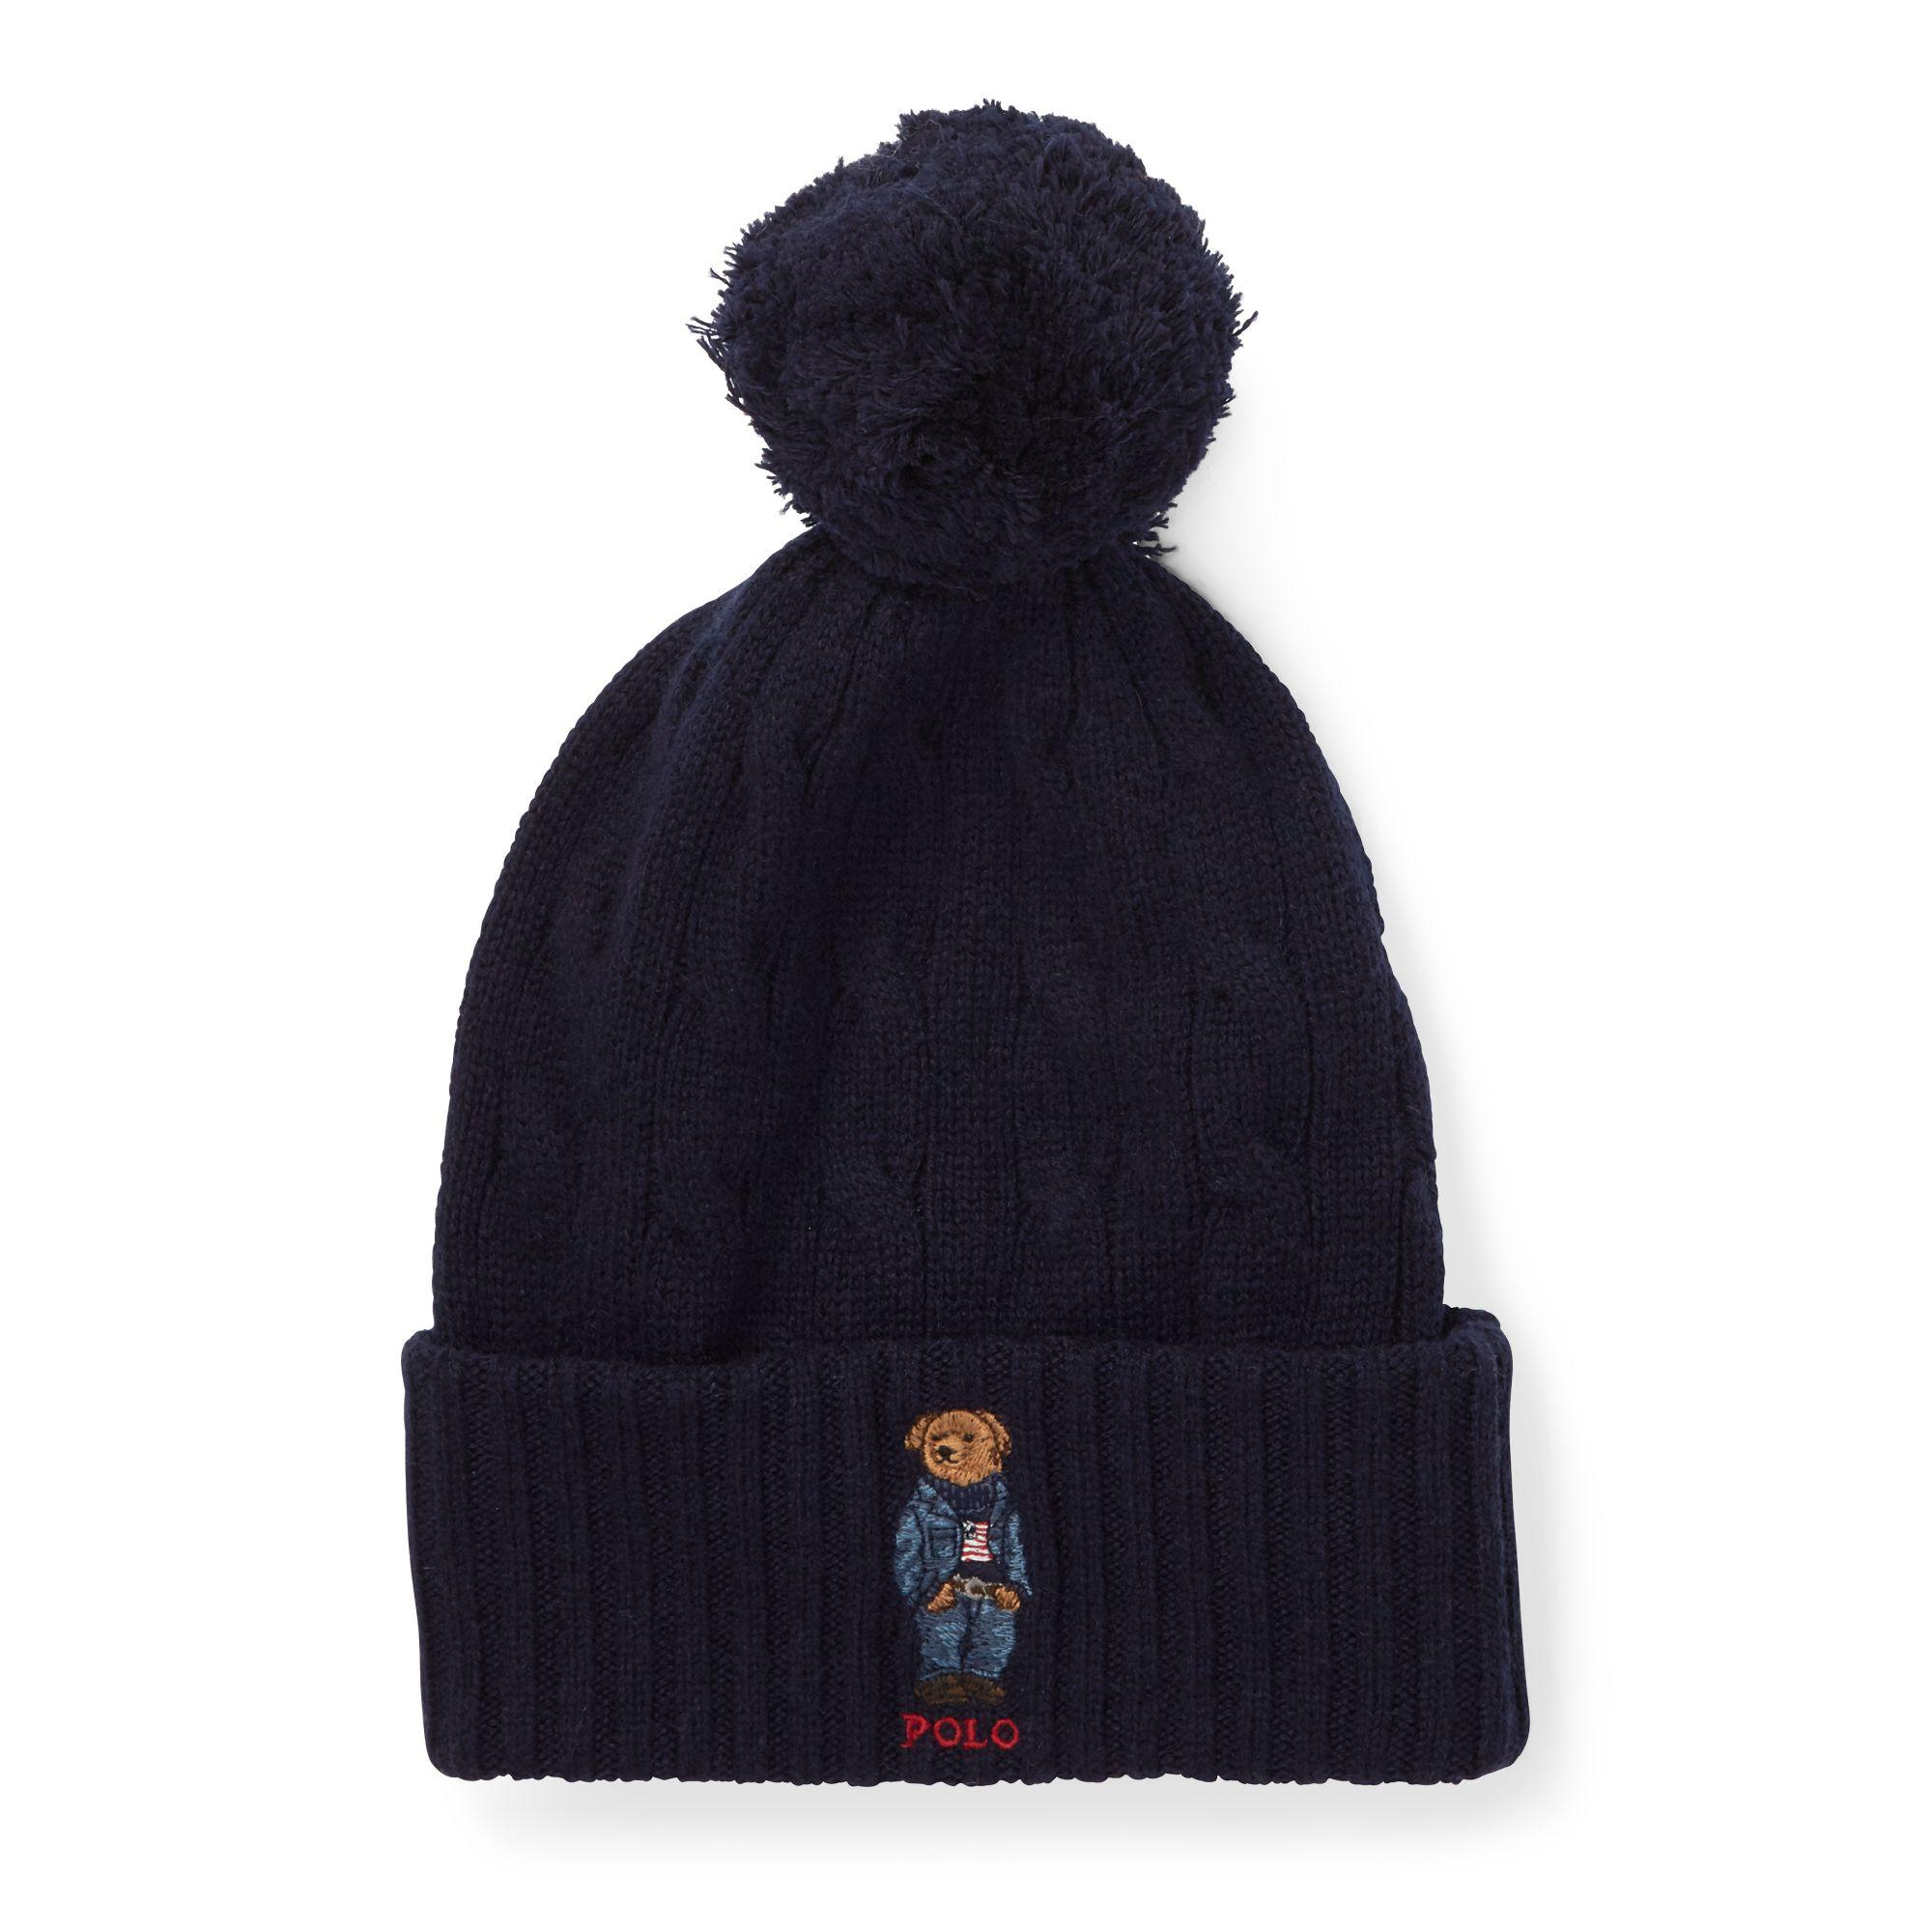 1b9e7b1e5facae Polo Ralph Lauren Polo Bear Pom-pom Hat in Blue - Lyst